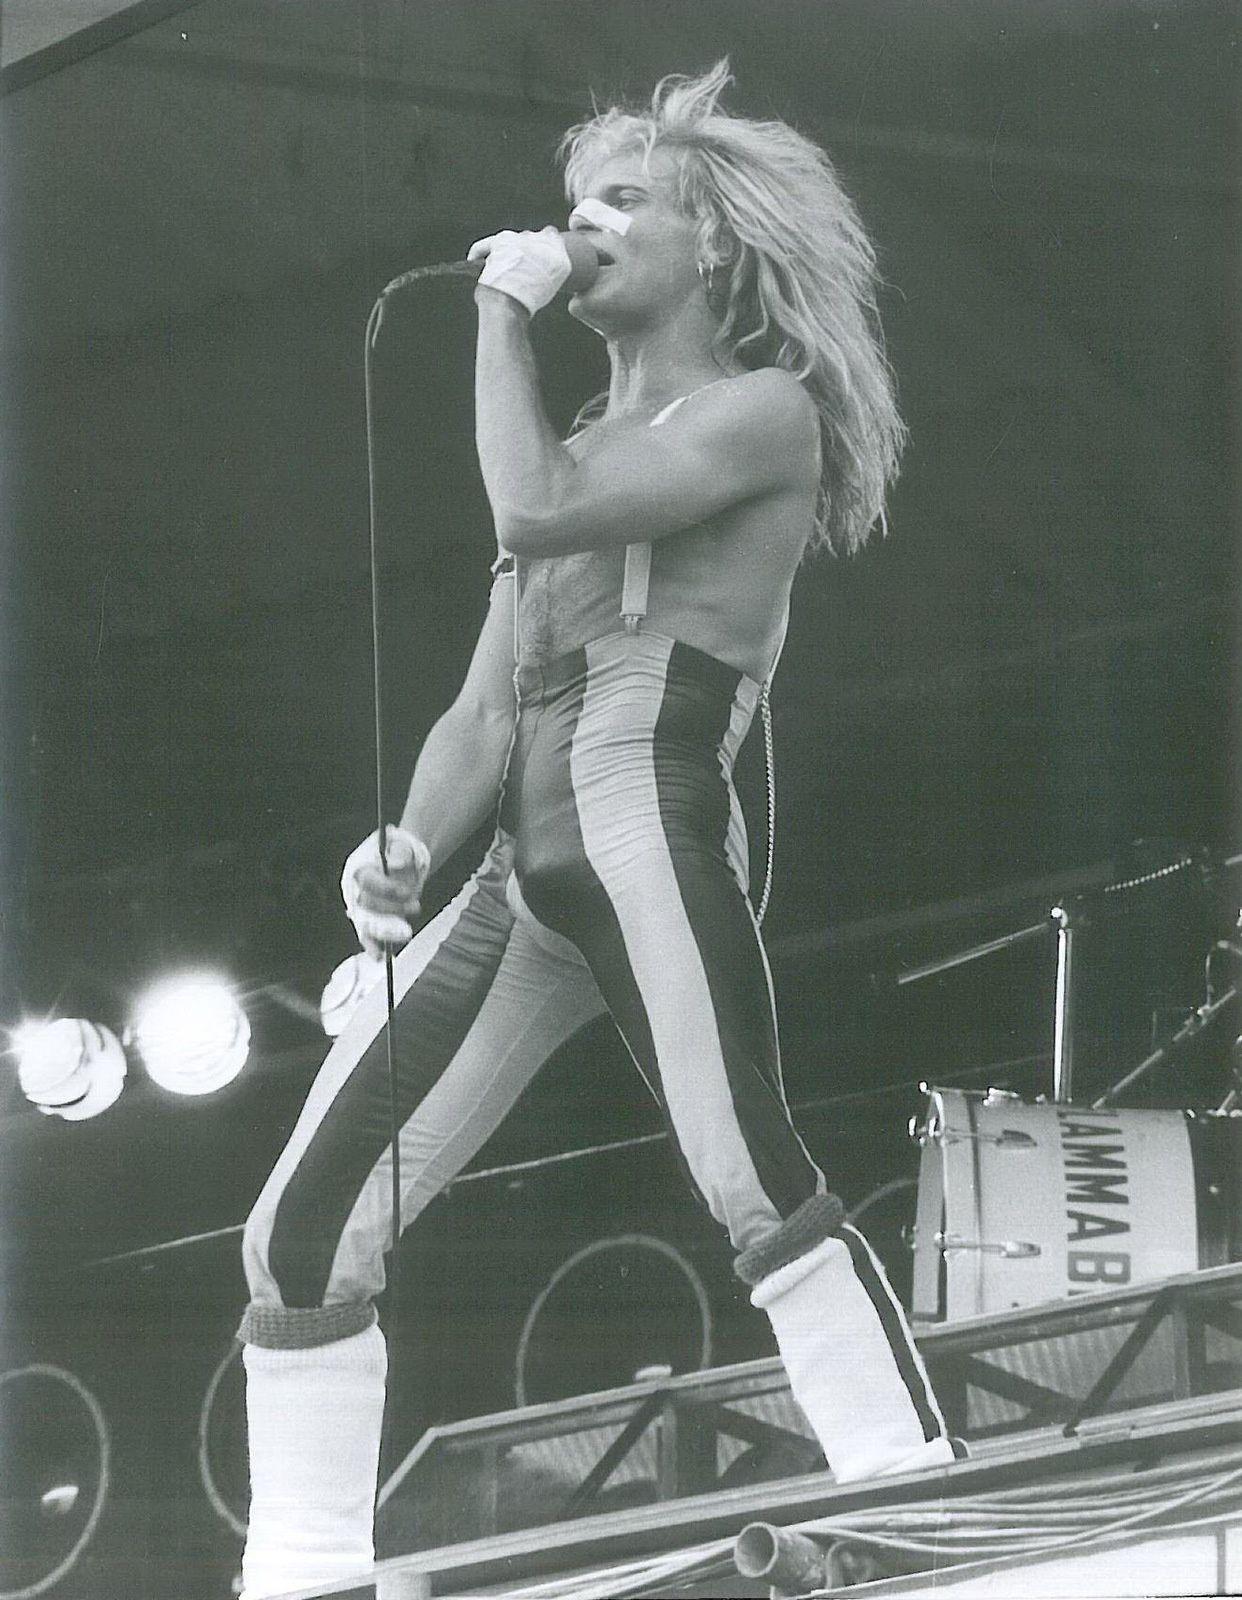 David Lee Roth, 1980 - on stage